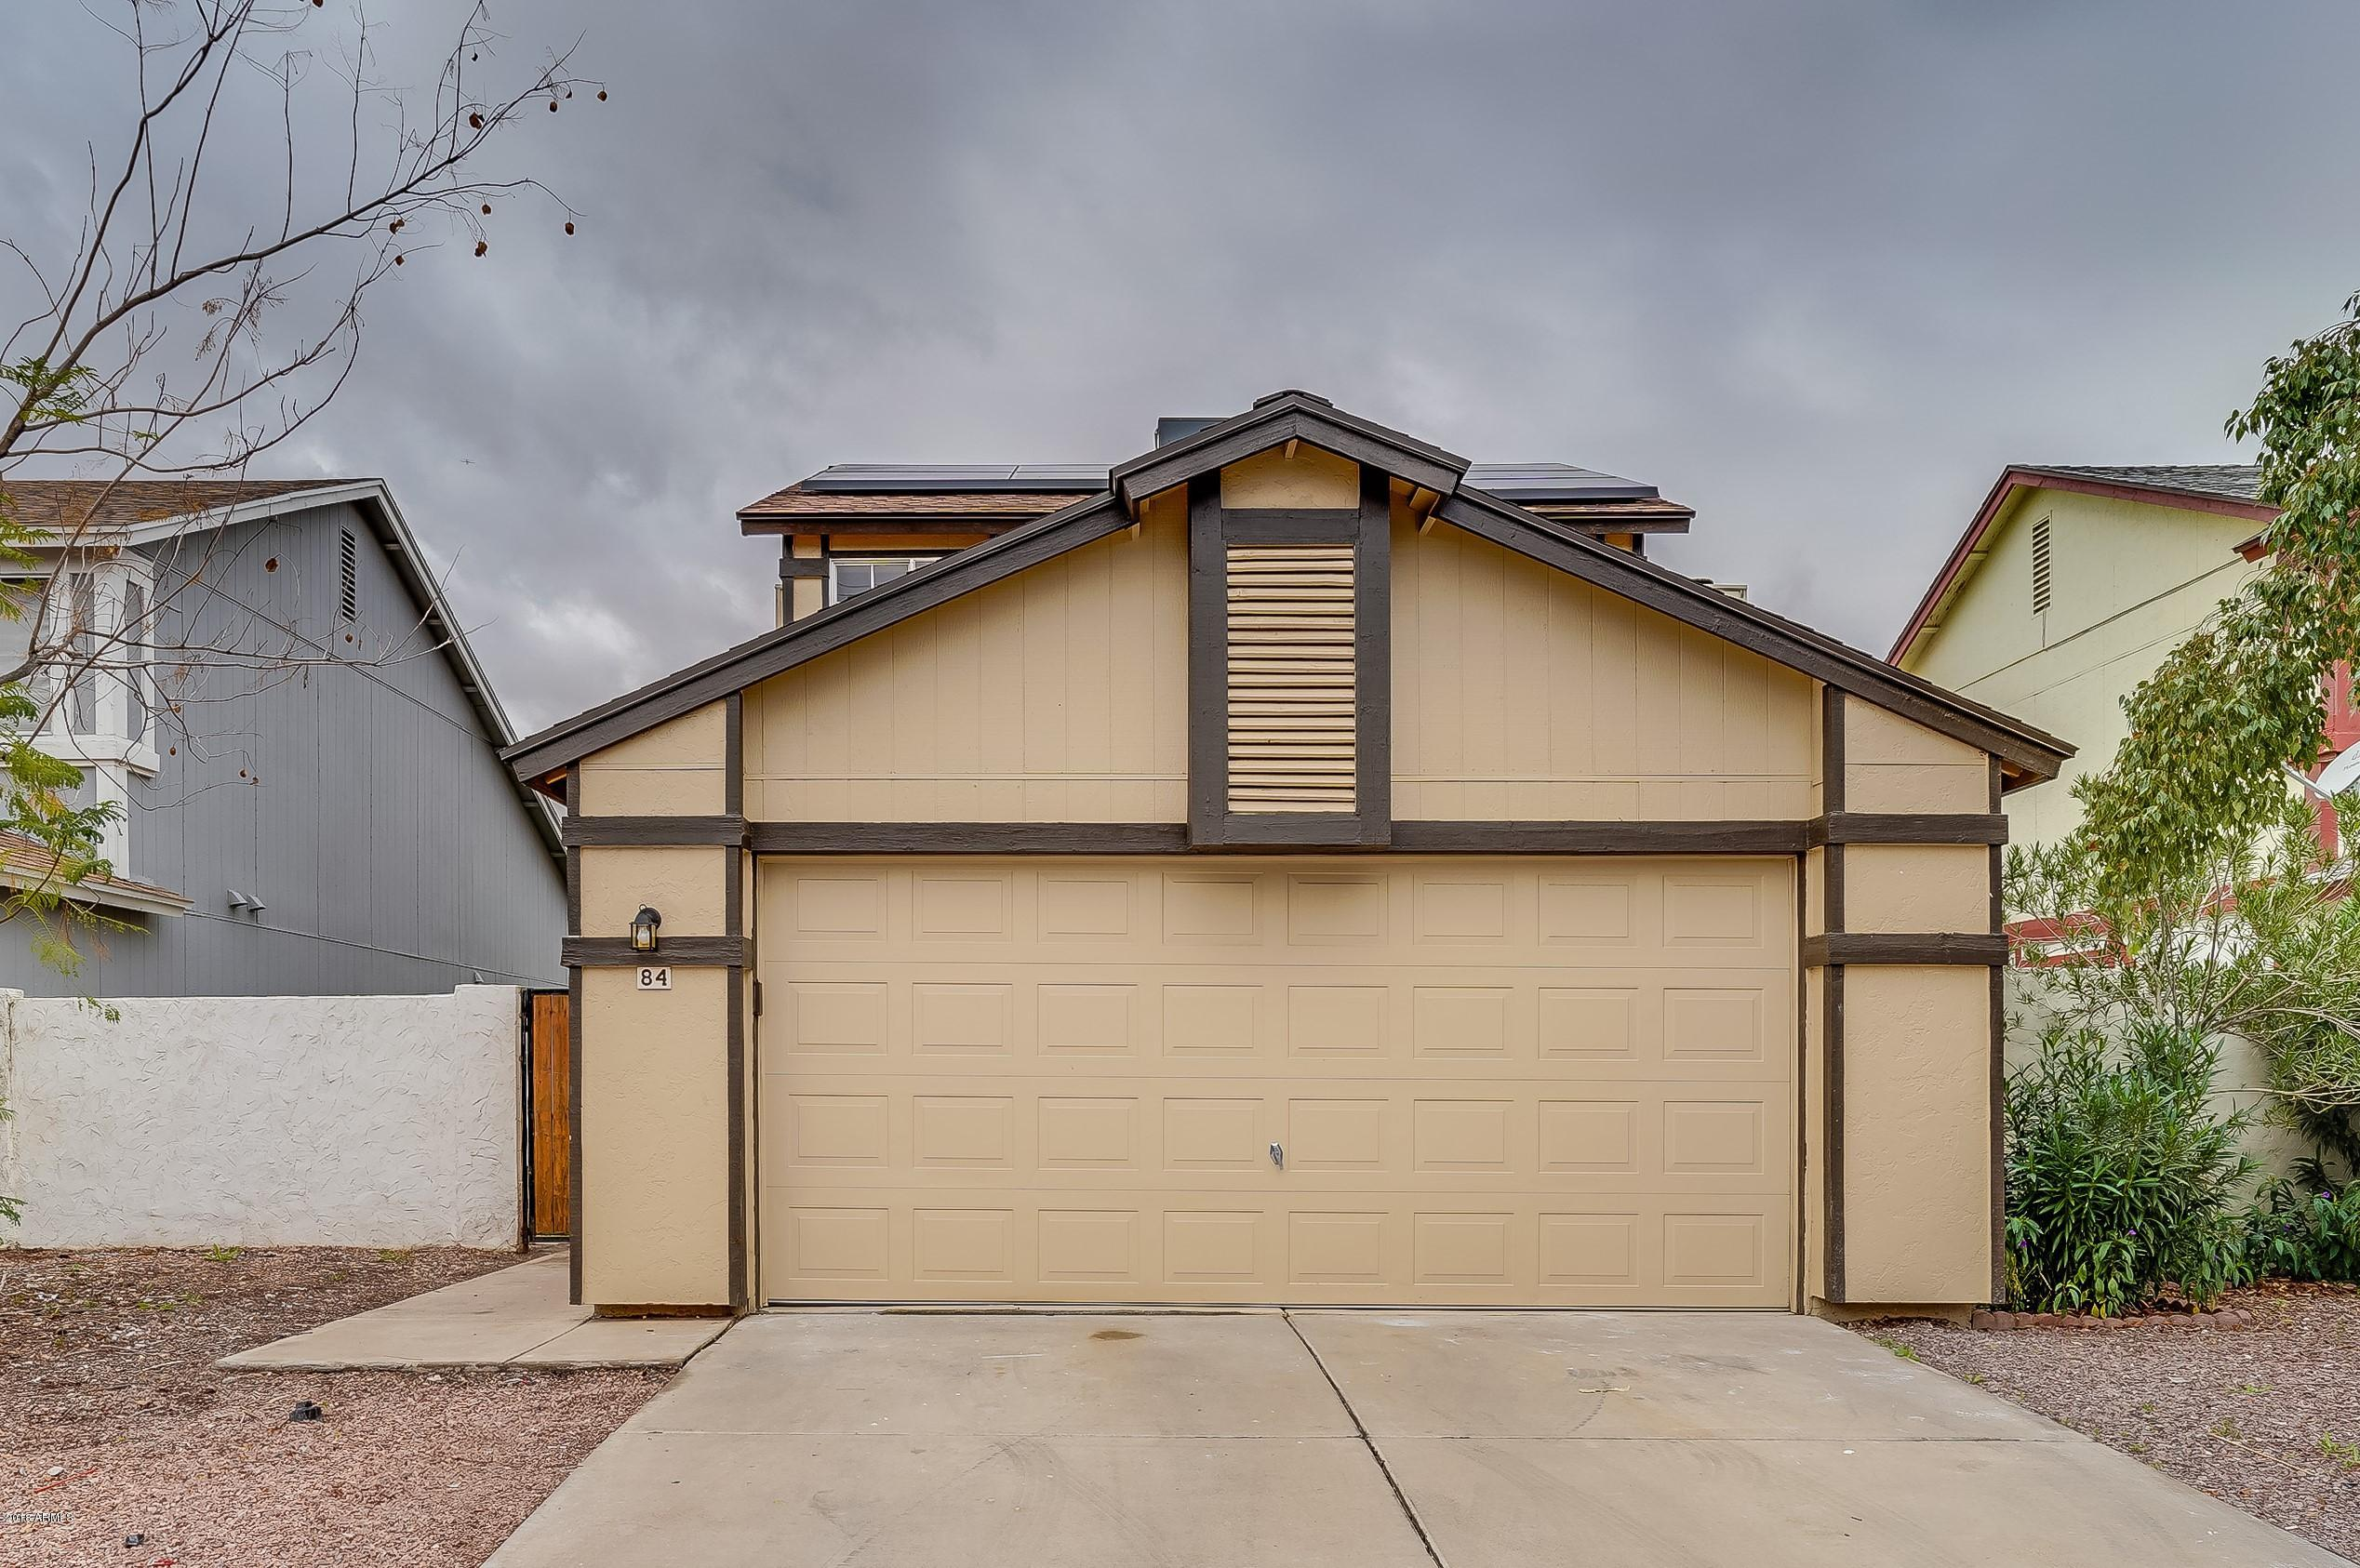 1915 S 39TH Street Unit 84 Mesa, AZ 85206 - MLS #: 5853834